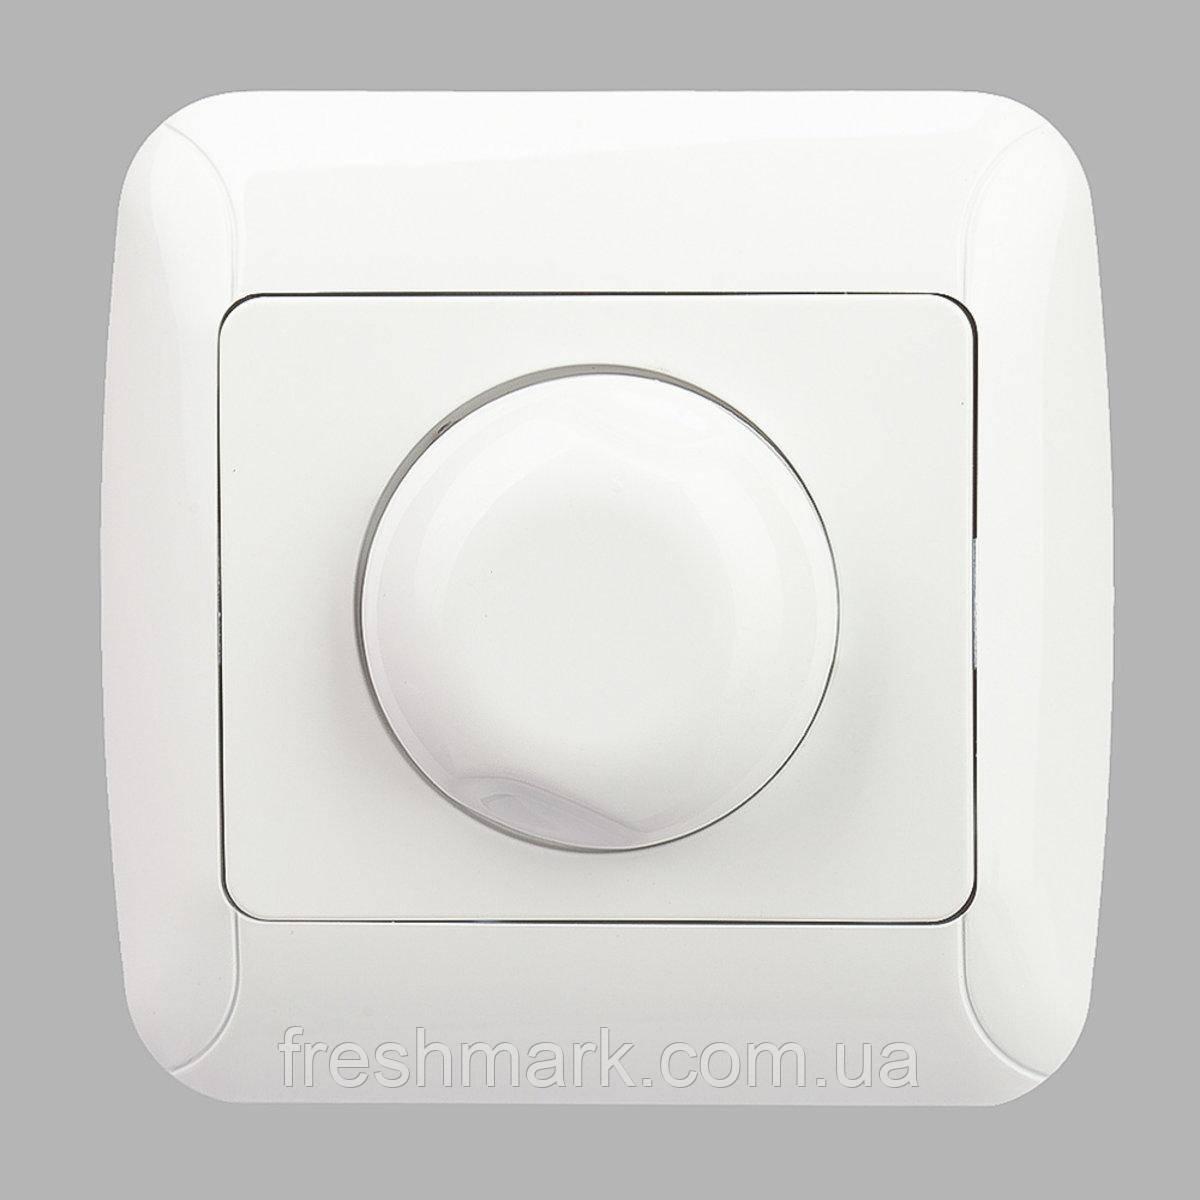 Светорегулятор GUNSAN Fantasy 1000Вт с подсветкой Белый